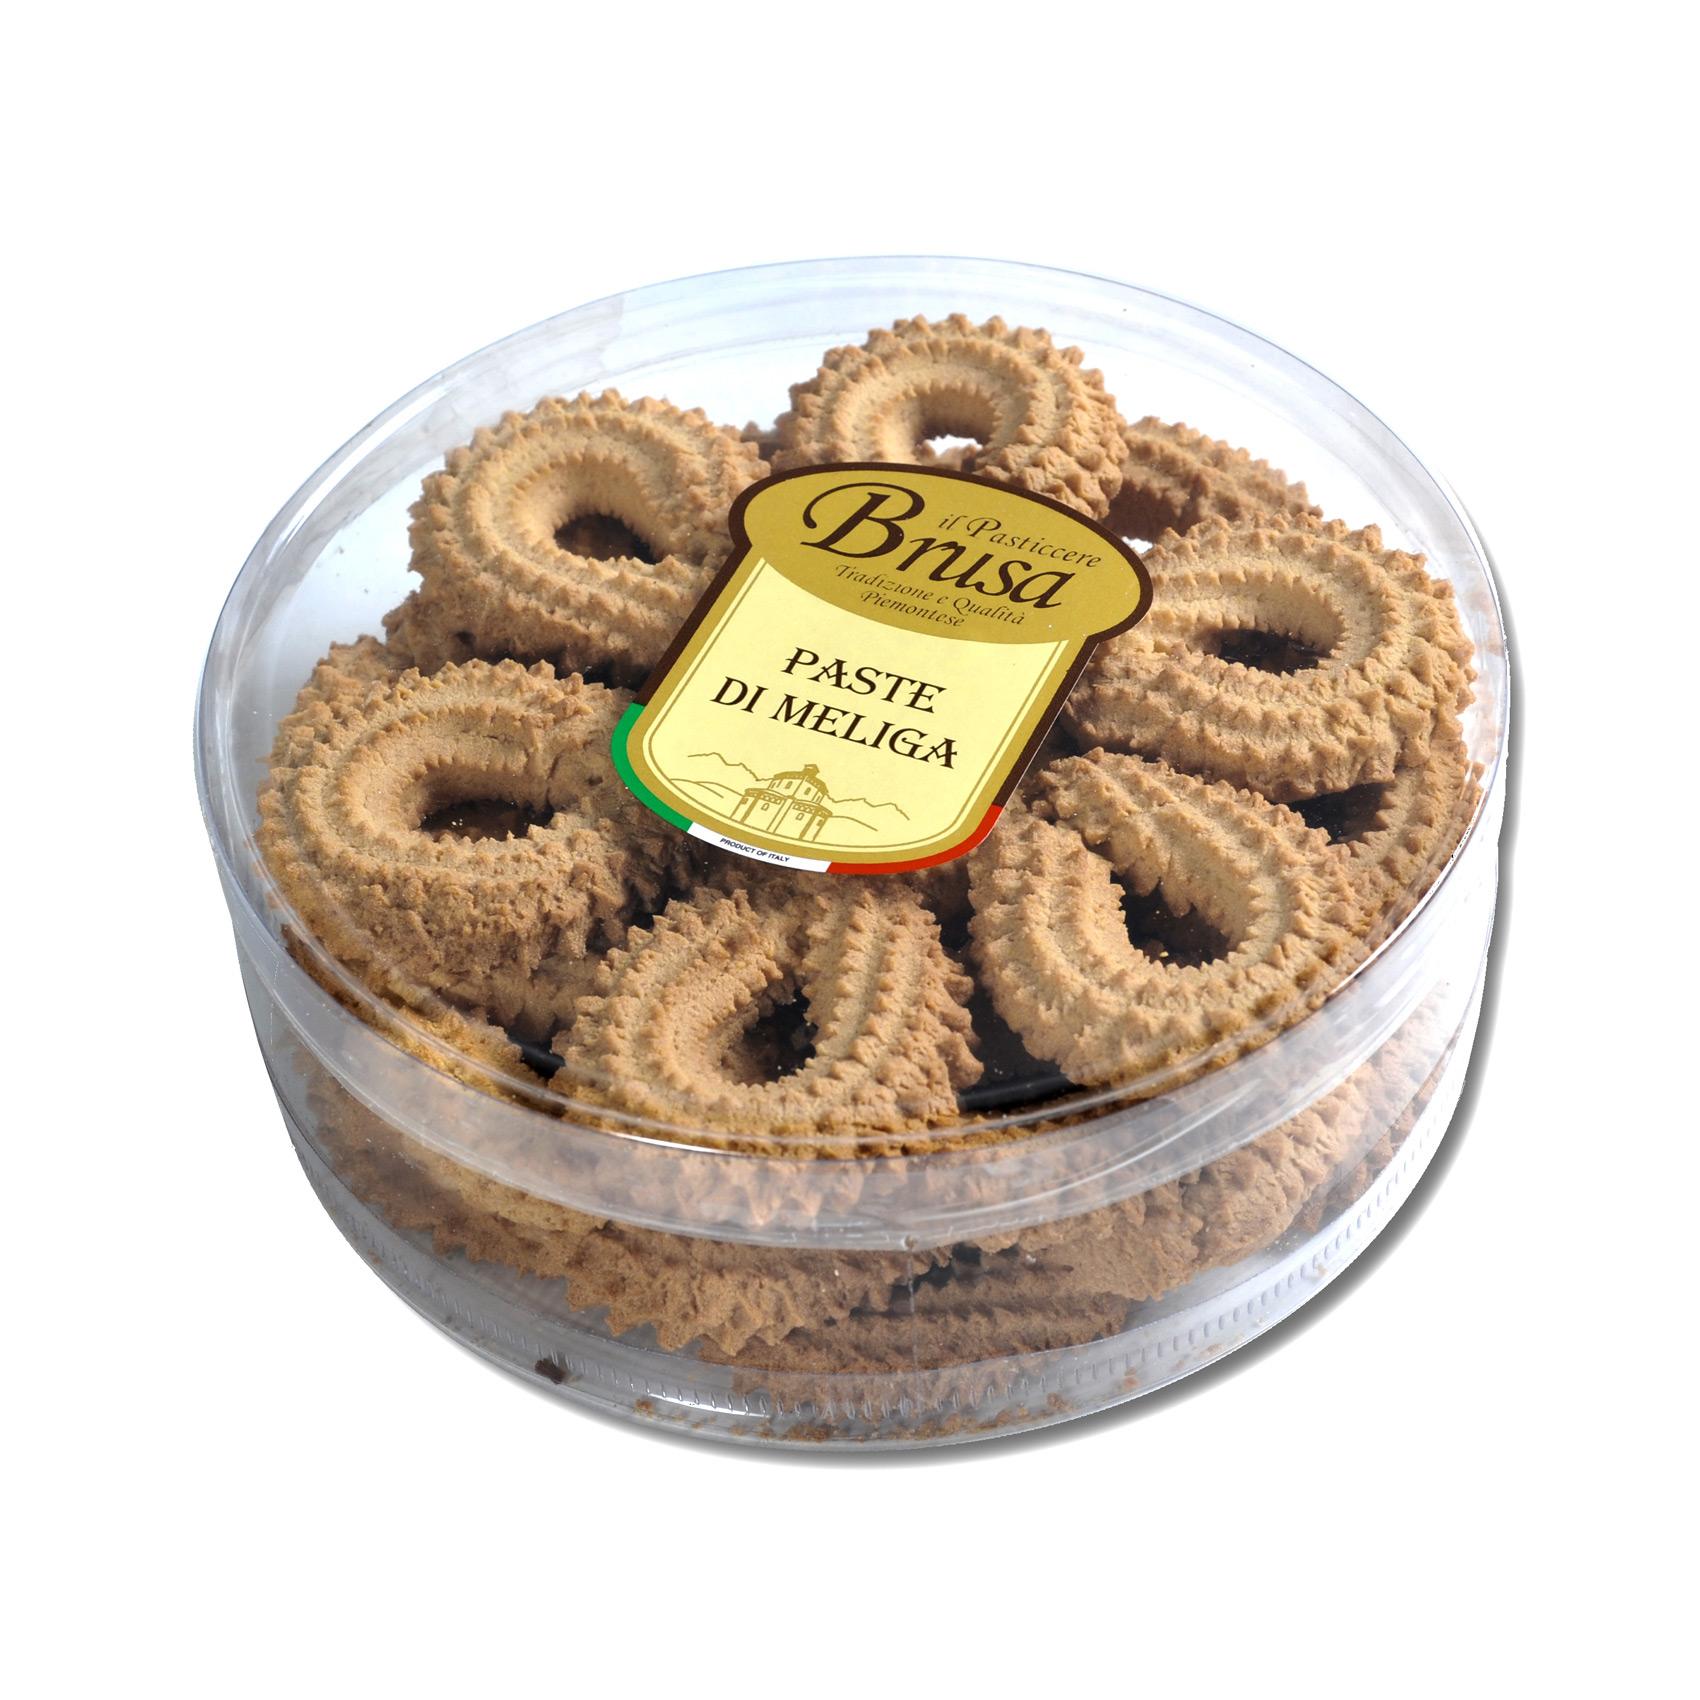 paste-di-meliga-biscuits-box-500g